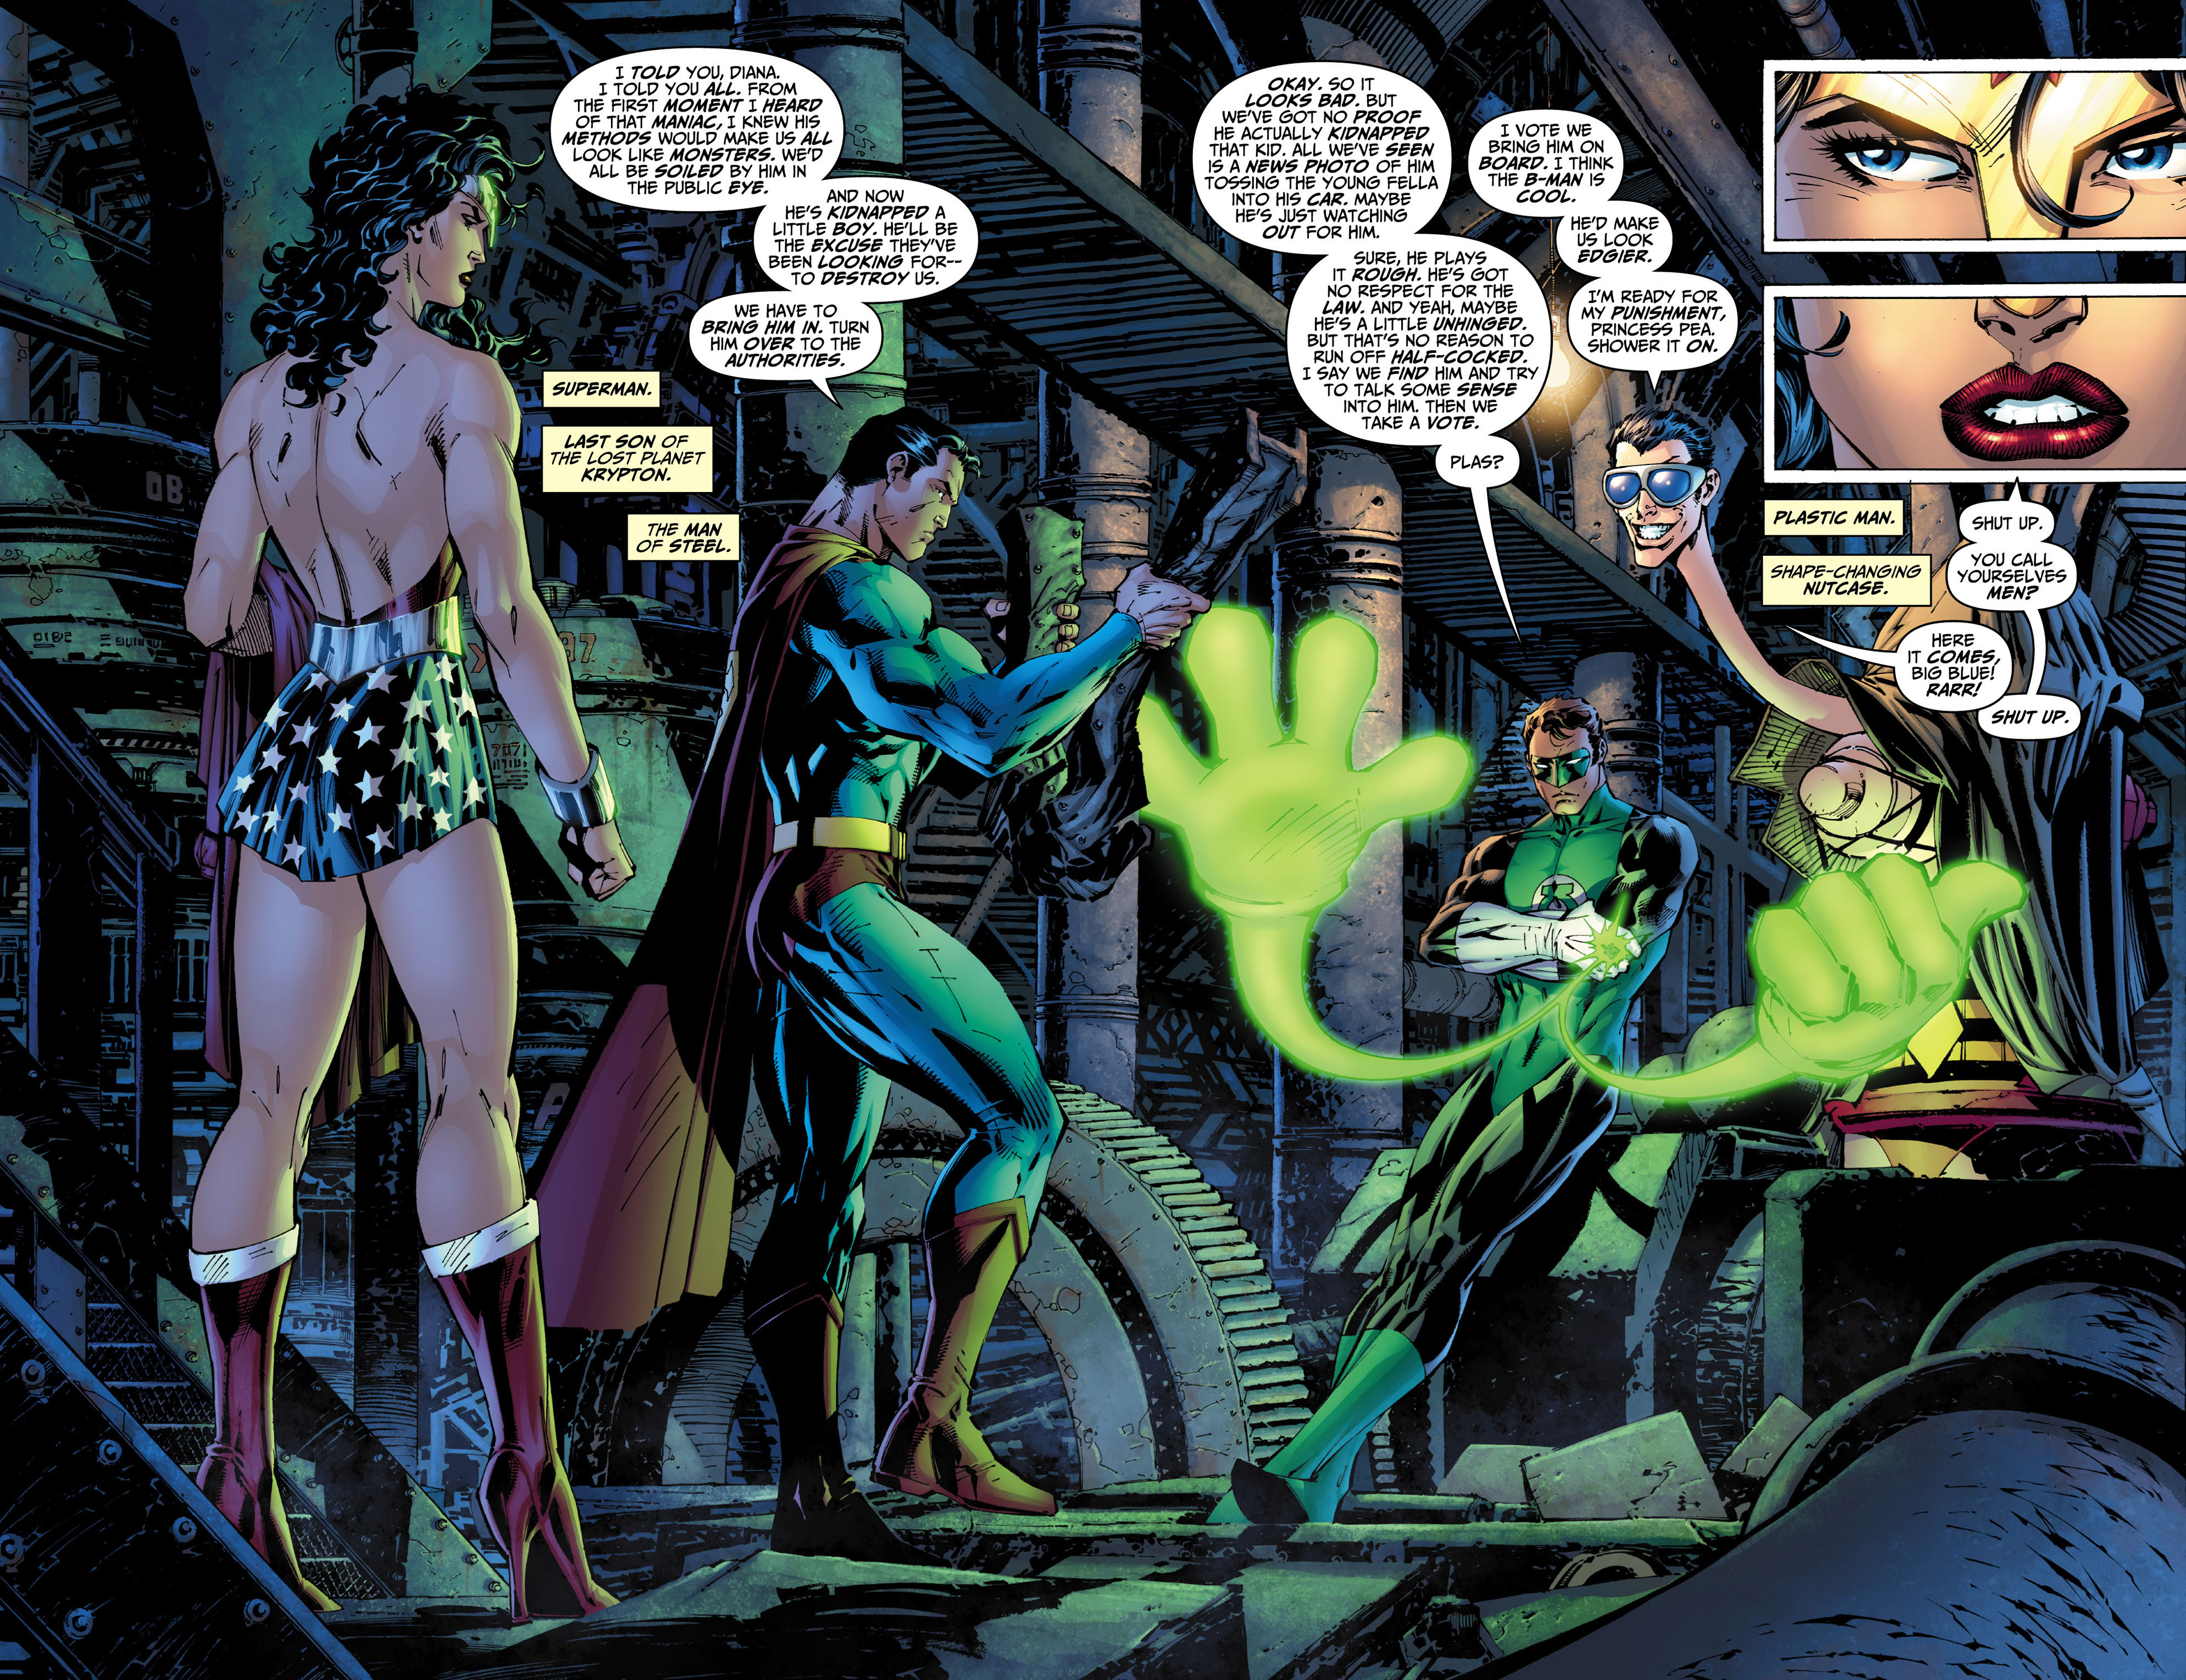 Read online All Star Batman & Robin, The Boy Wonder comic -  Issue #5 - 5